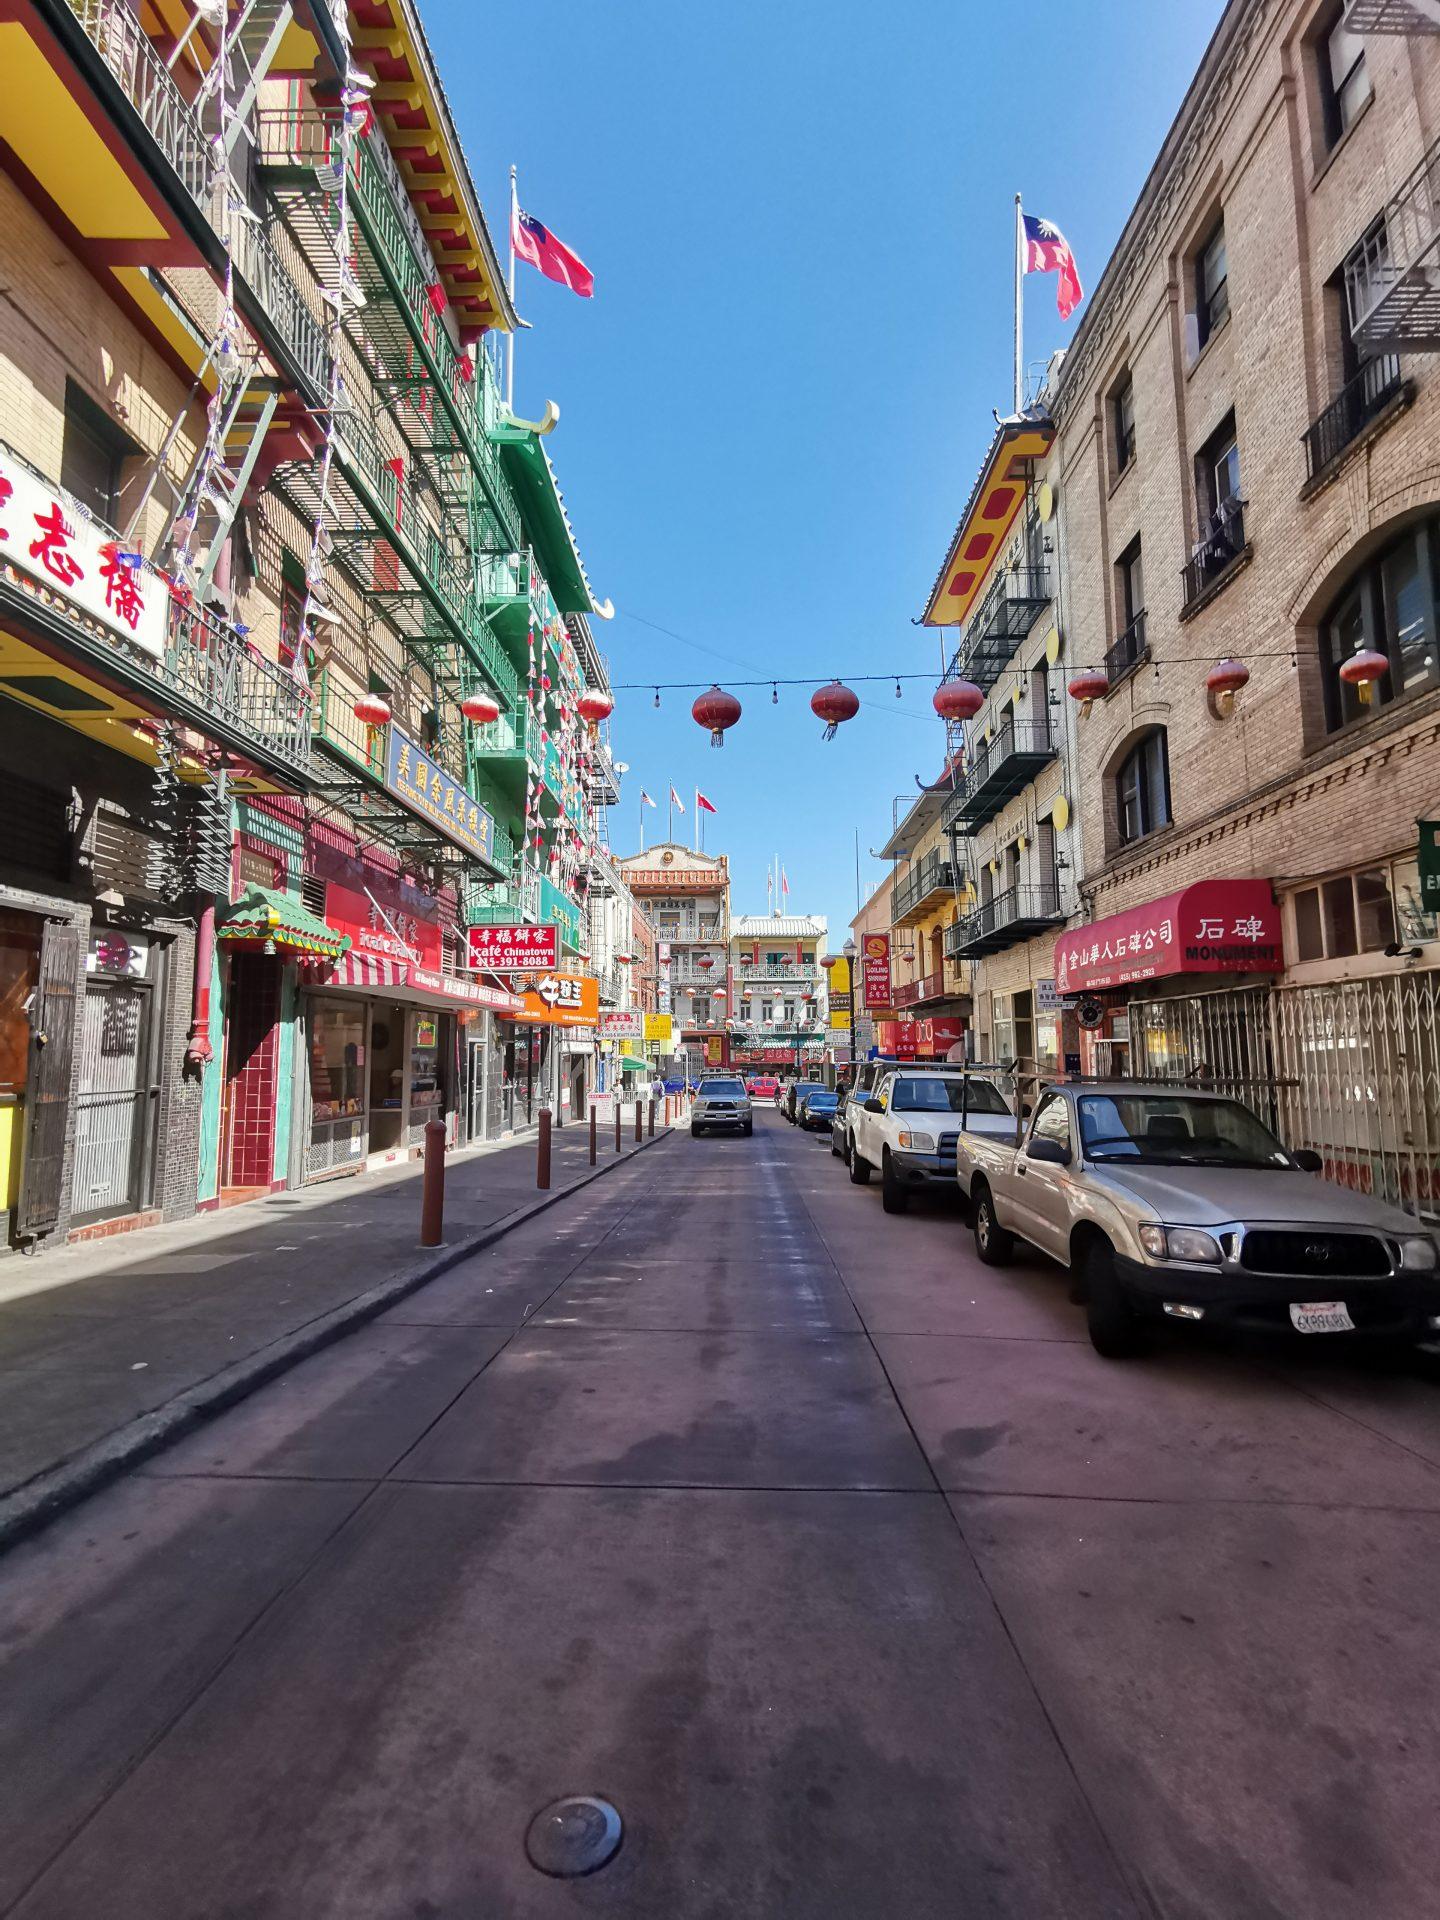 TREK AMERICA   GRAND TREK   DAY 25: SAN FRANCISCO   hayleyxmartin.com